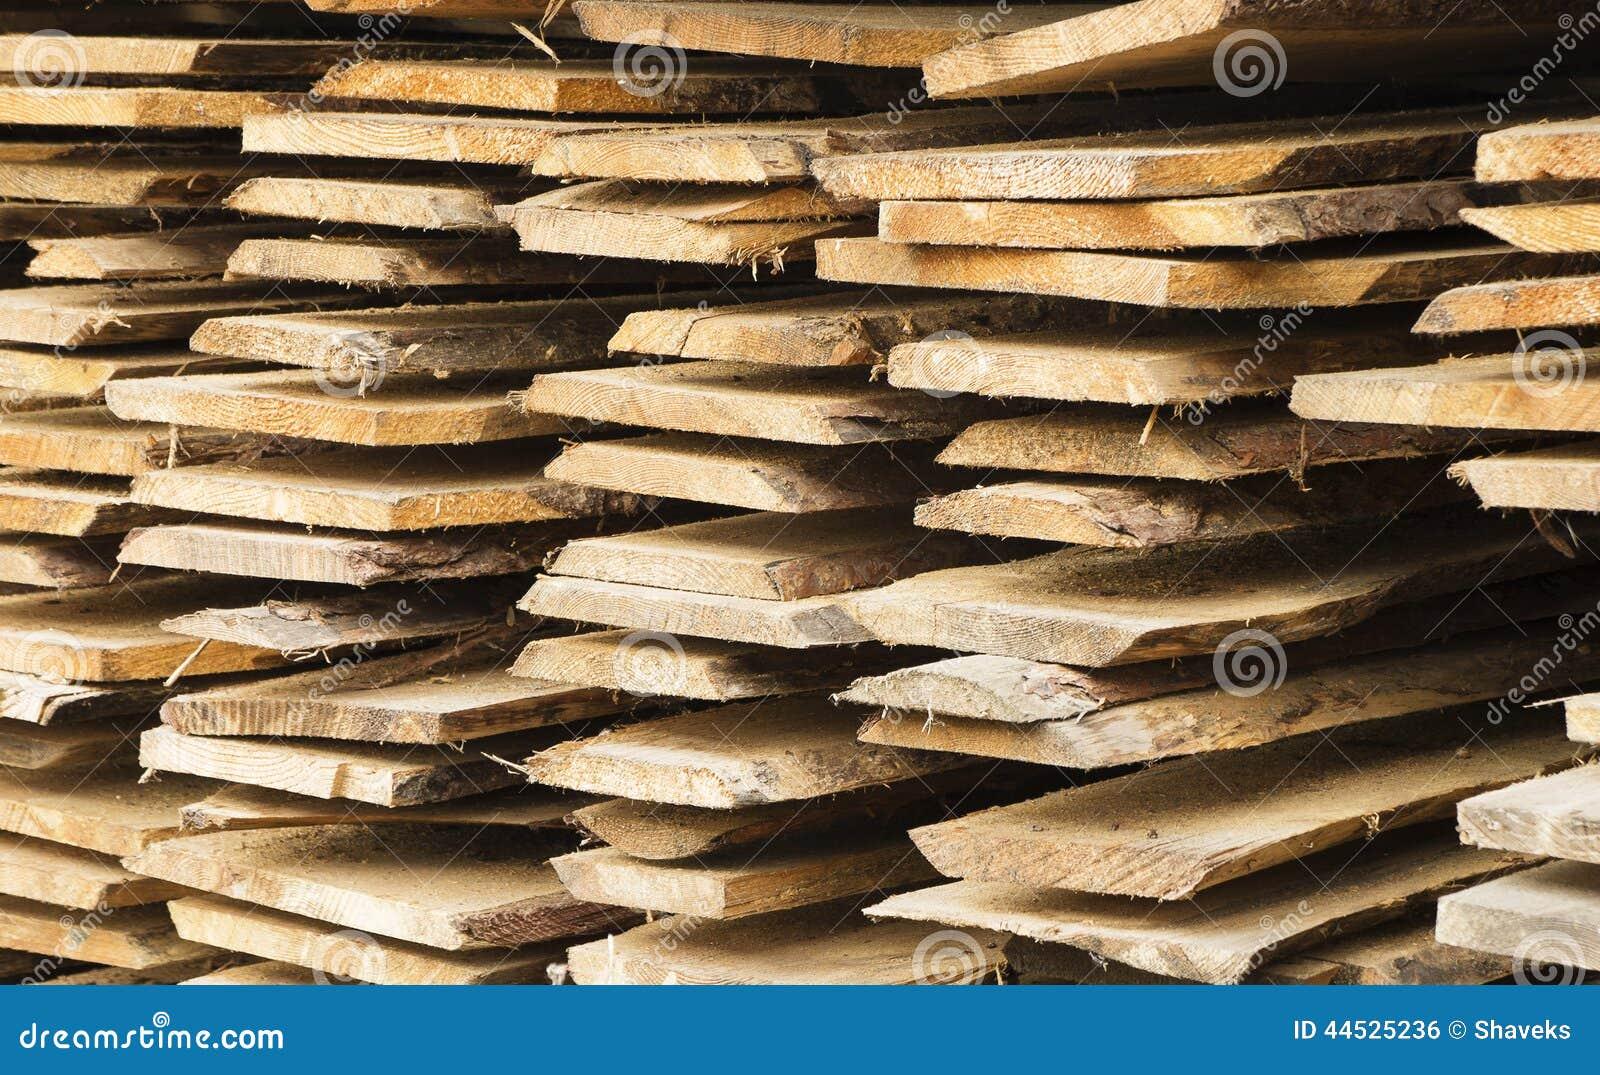 planche en bois rugueuse dans le tas photo stock image. Black Bedroom Furniture Sets. Home Design Ideas